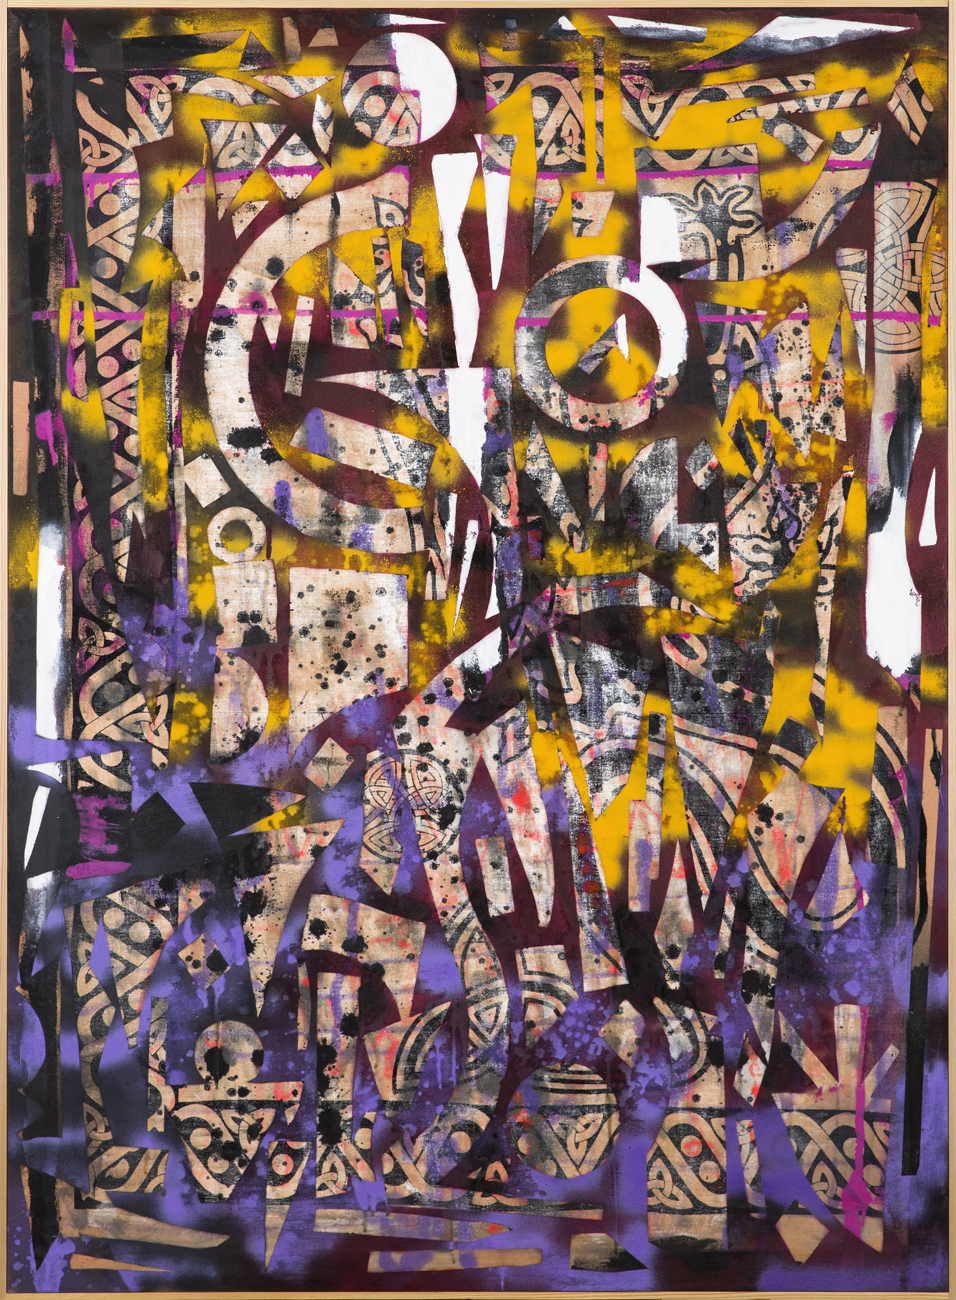 Alfred Boman  Utan titel  2013 Oil on canvas 142 x 102 cm